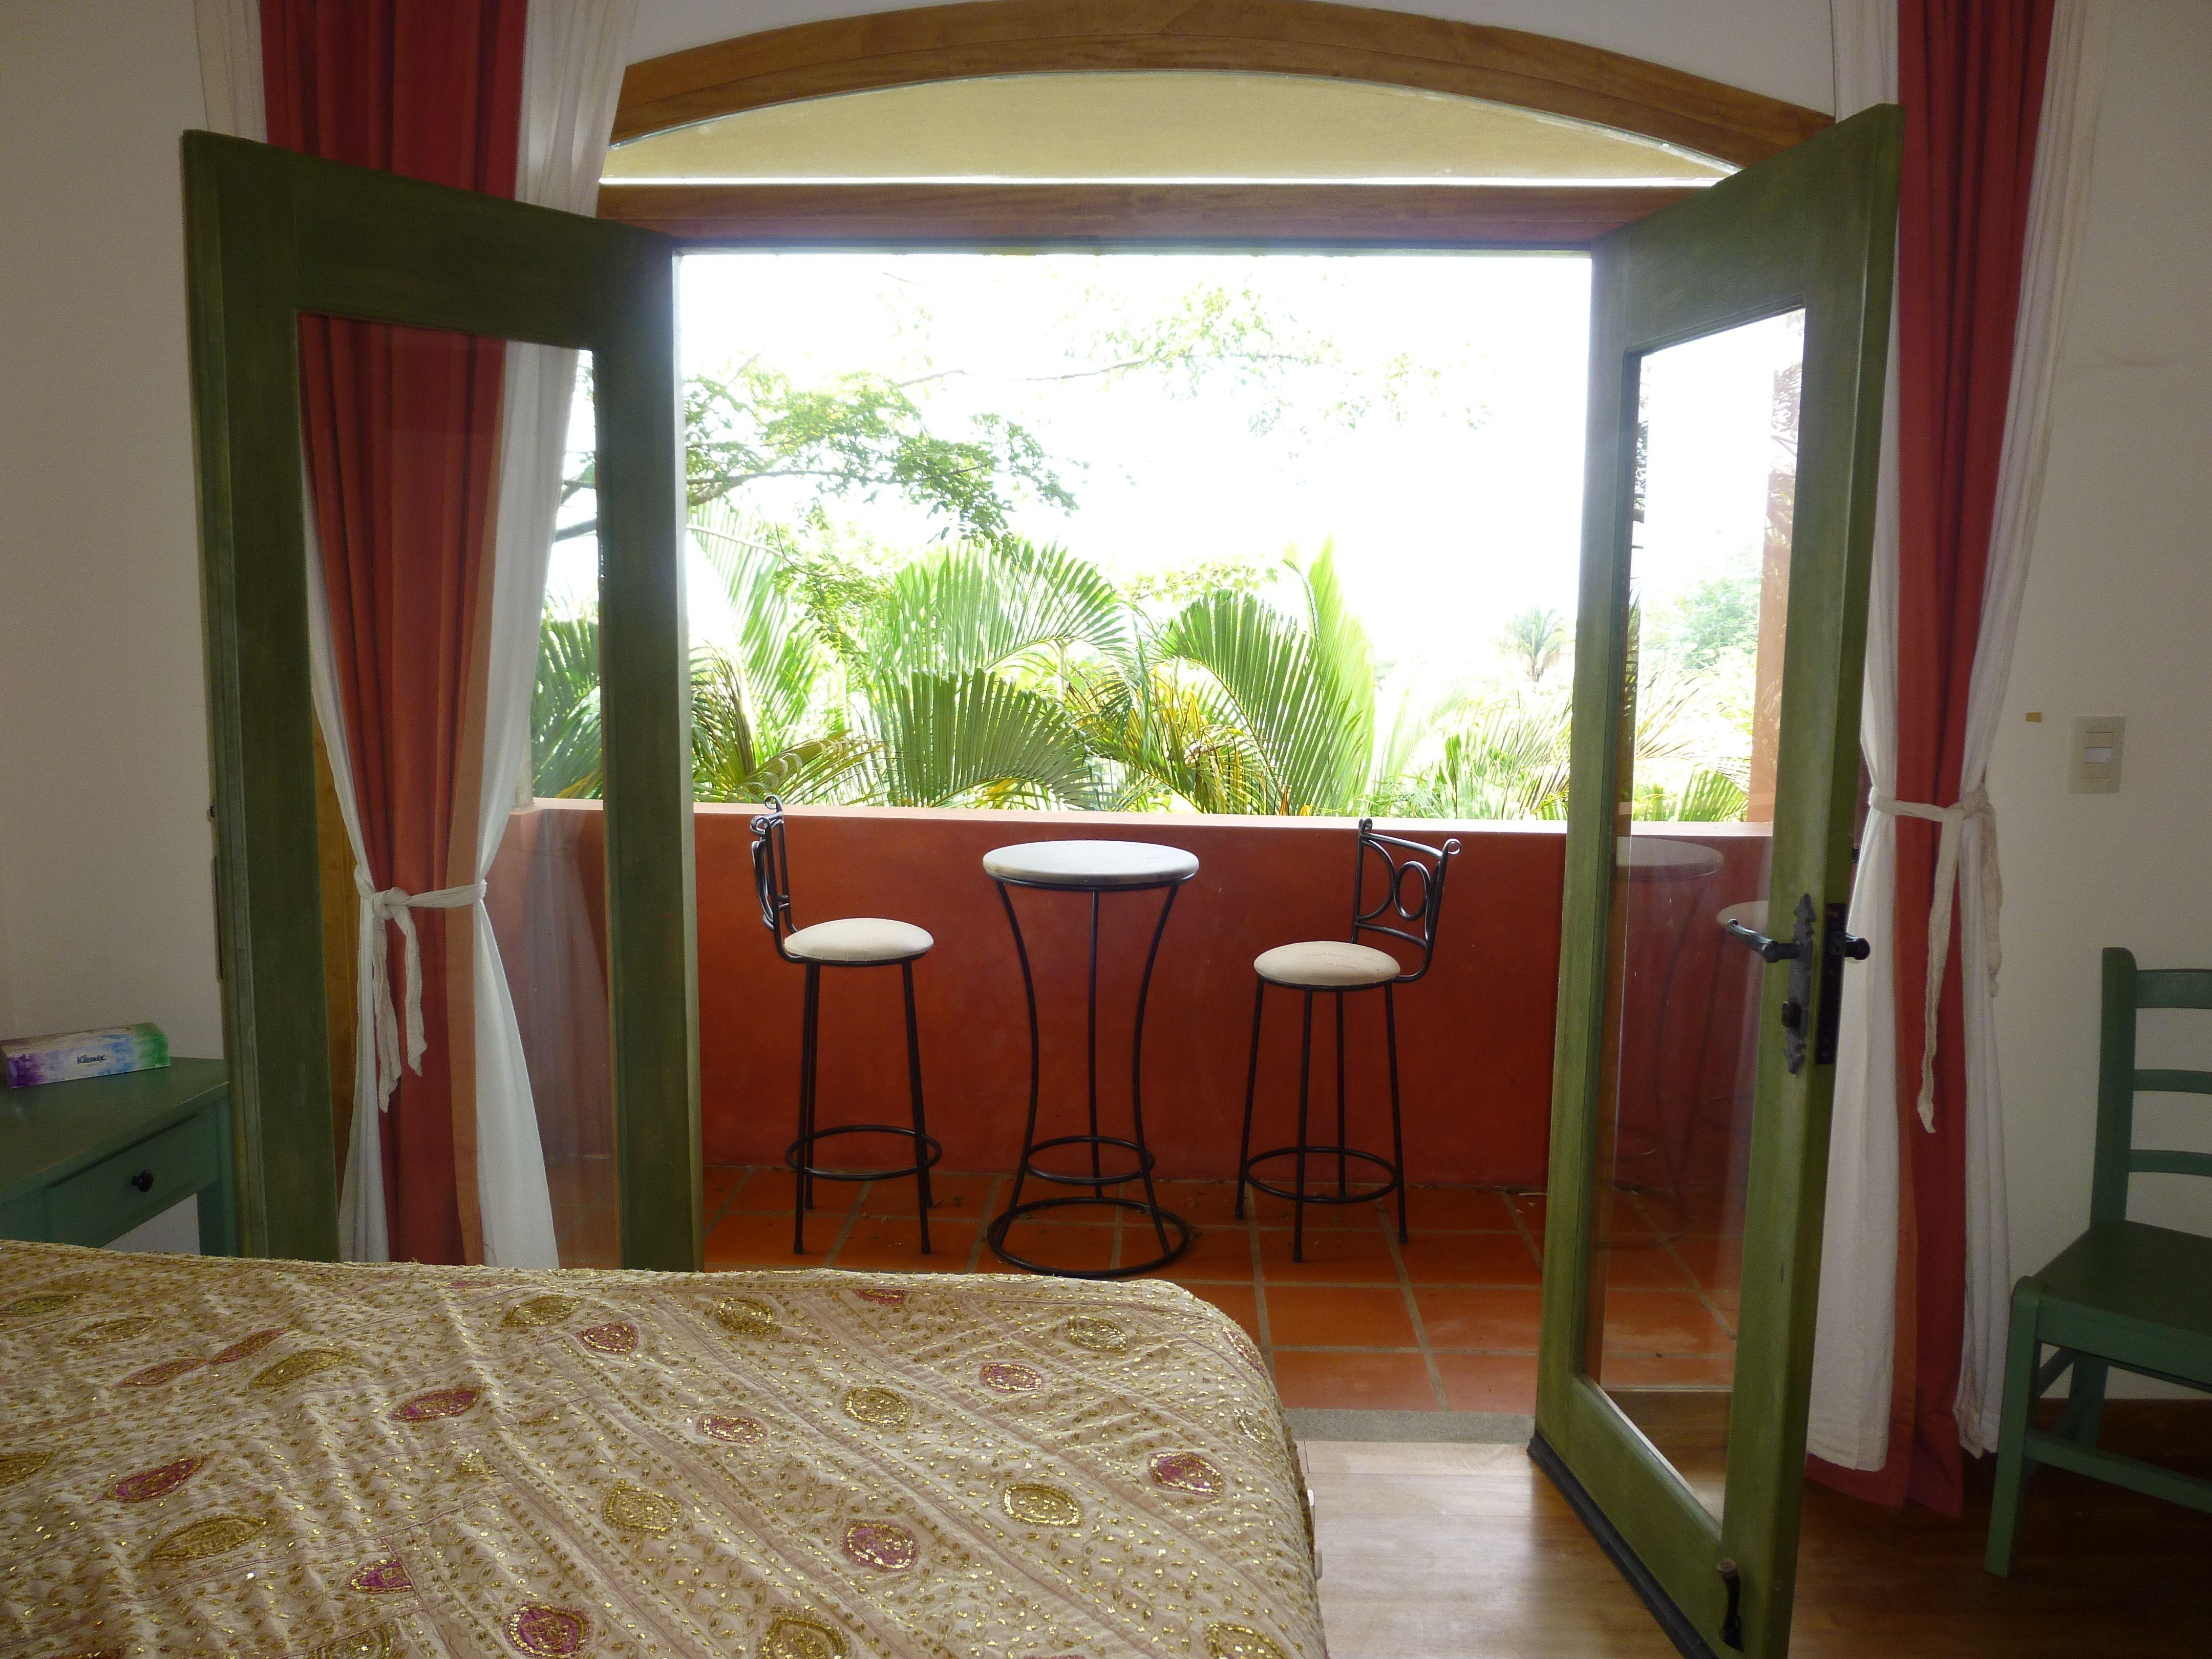 http://ackermanrealtyinternational.com/property/casa-oceana/ … #CostaRica #costaricahomeforsale - Costa Rica Home for Sale #buycostaricahomeforsale - Buy Costa Rica Home for Sale